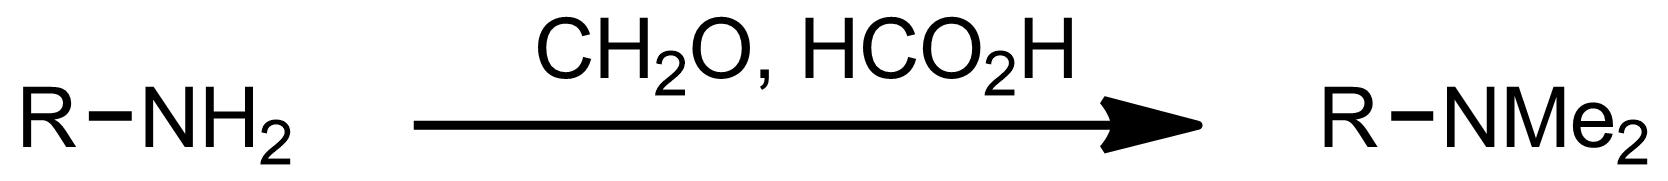 Schematic representation of the Eschweiler-Clarke Reaction.